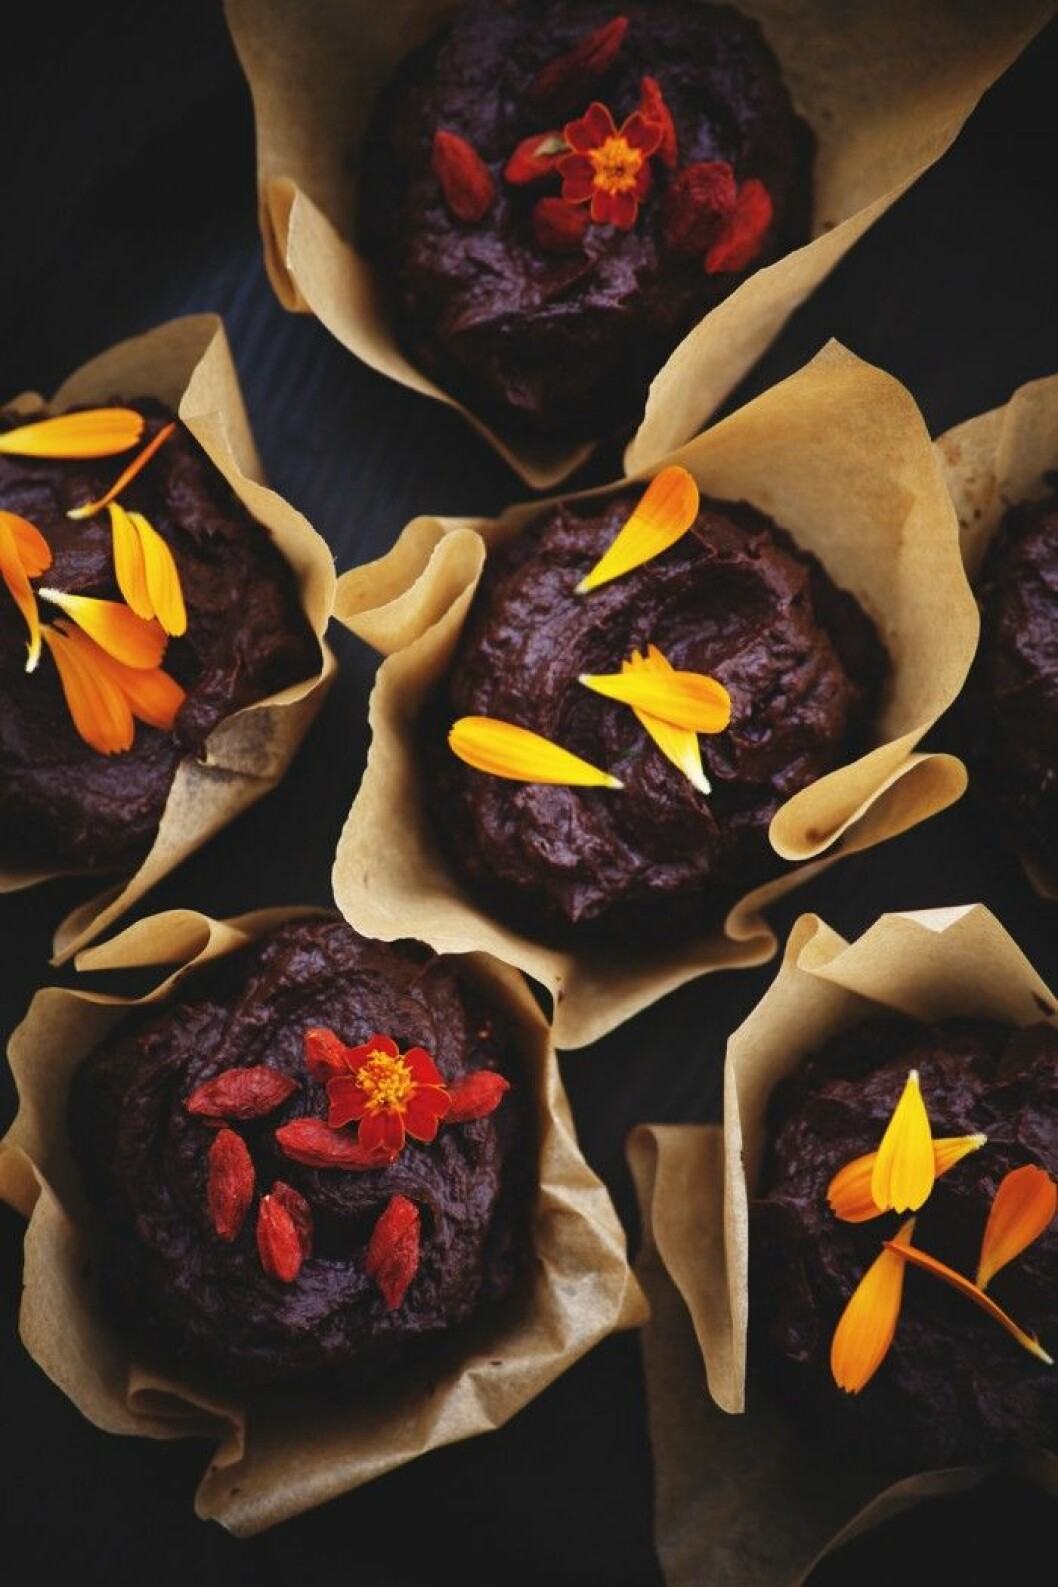 Choklad- och zucchinimuffins + äpple- och havremuffins